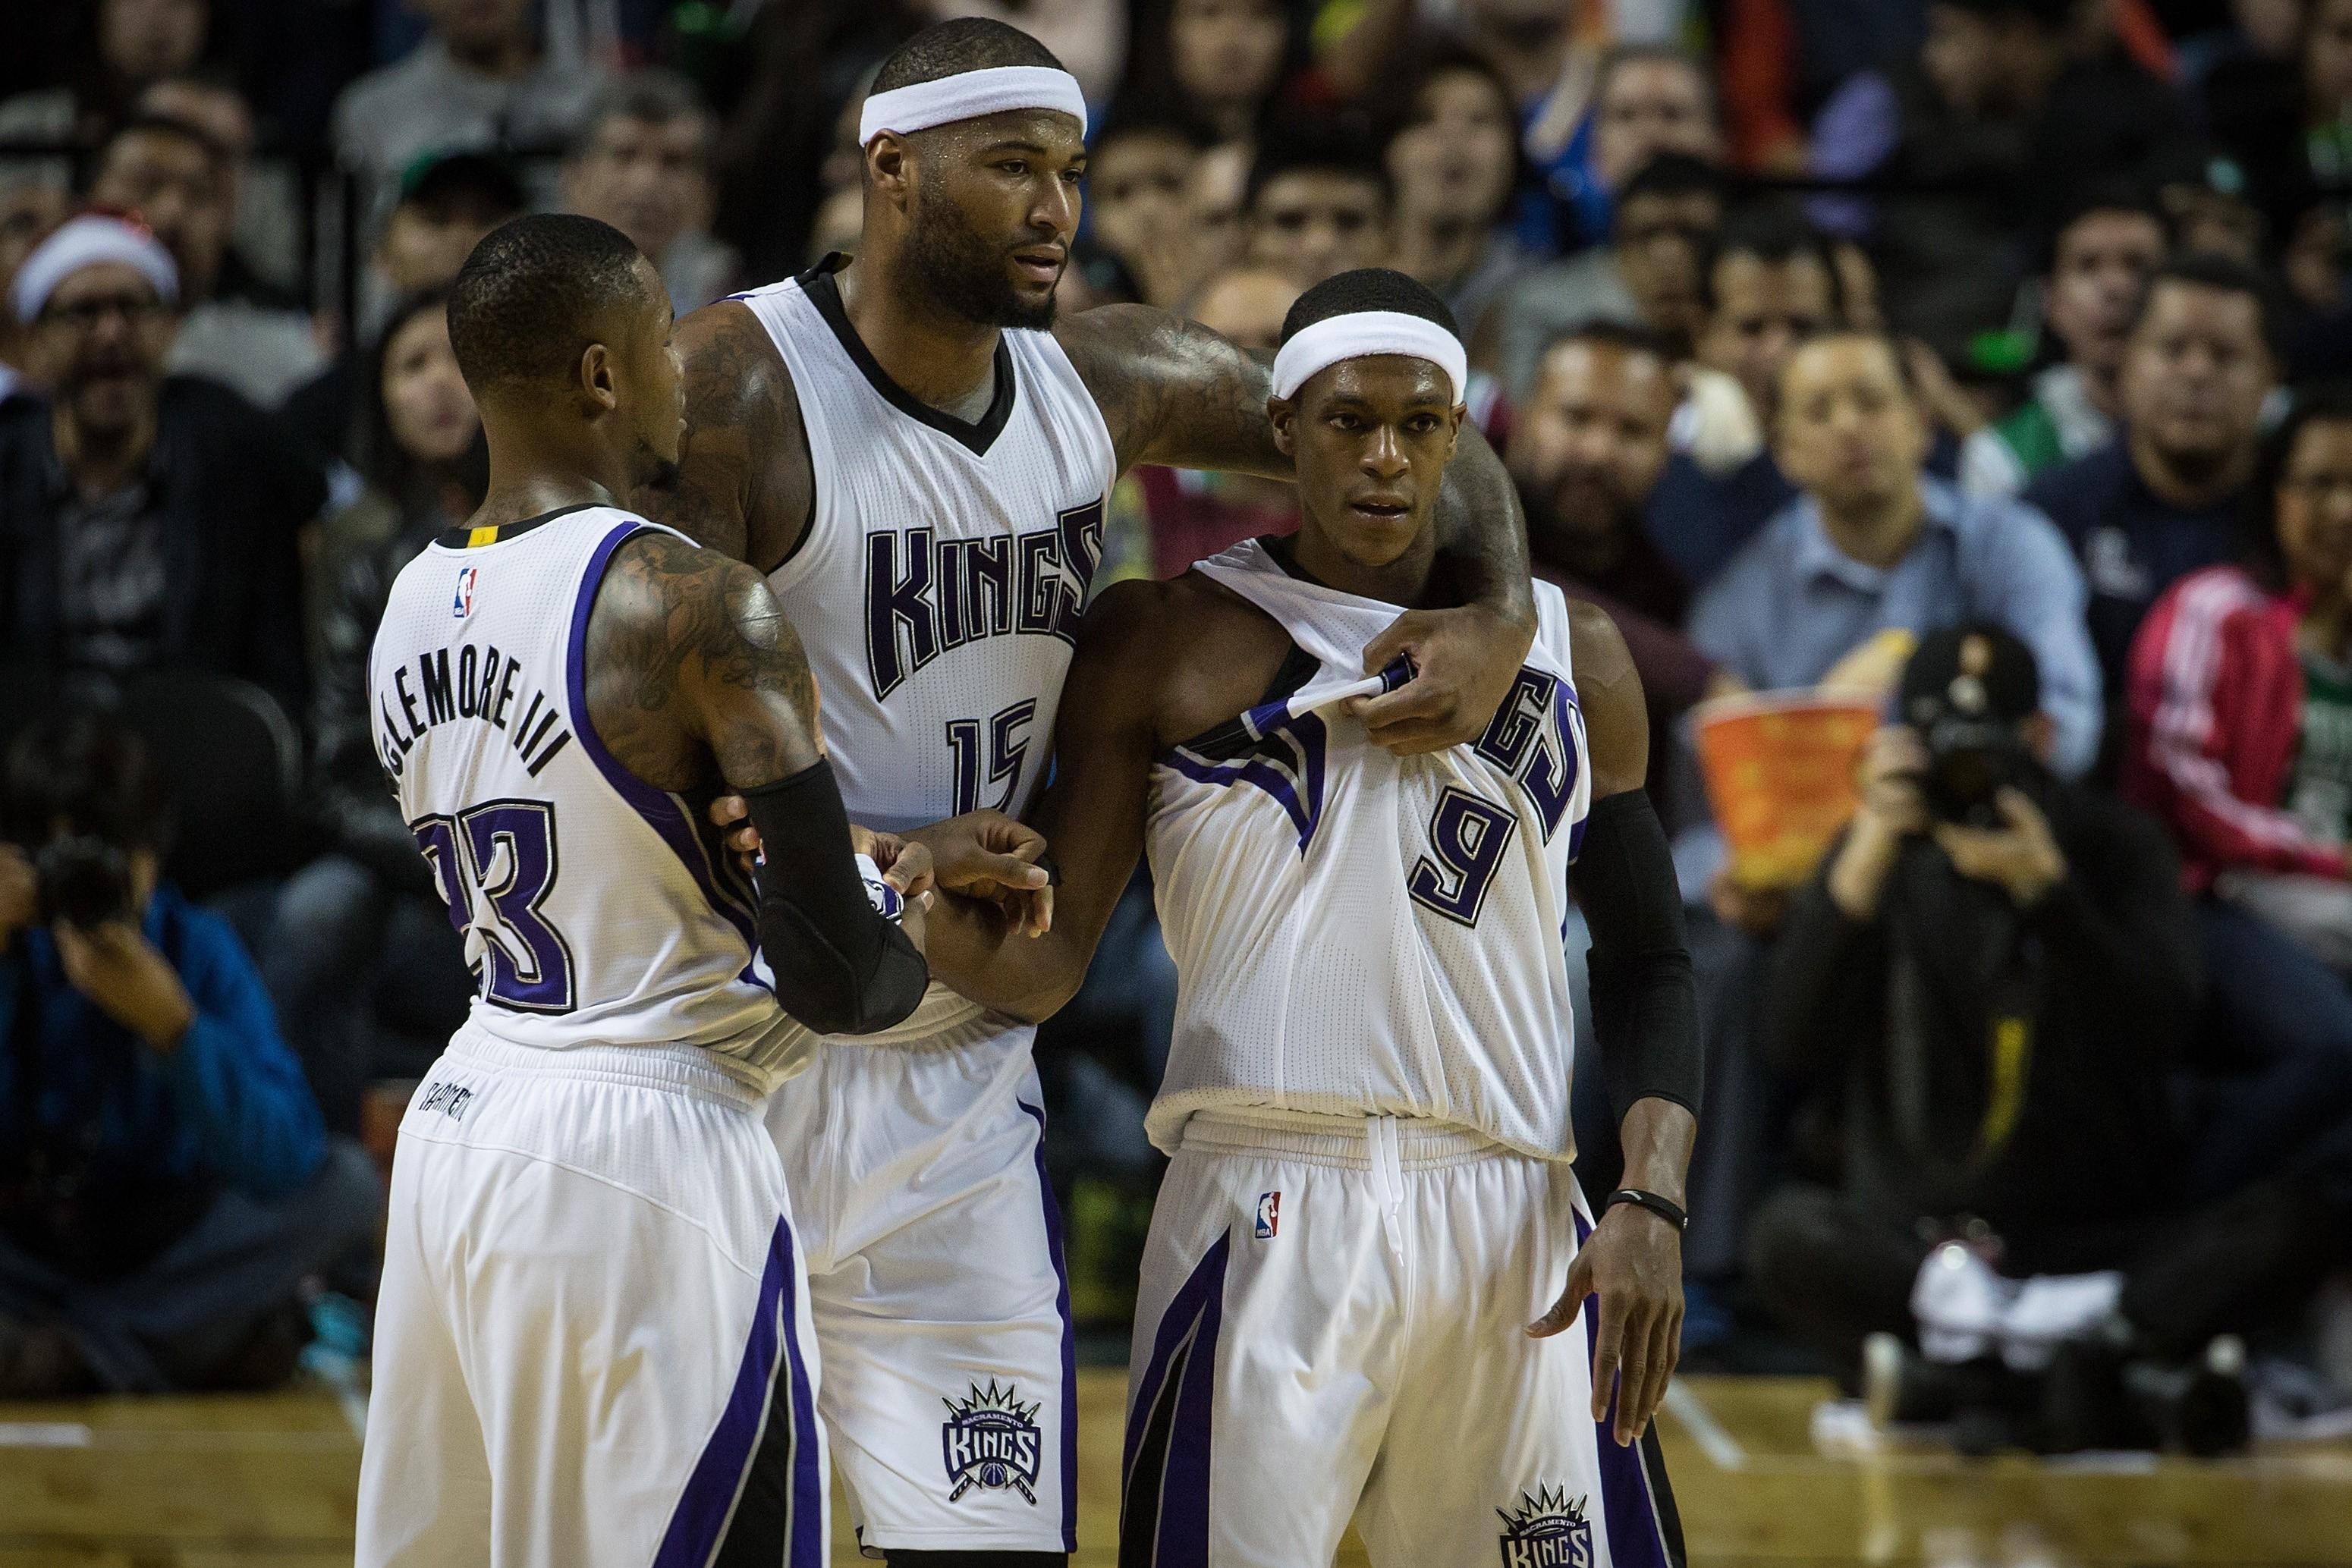 Celtics Vs Kings Image: DeMarcus Cousins And Rajon Rondo: A True Love Story